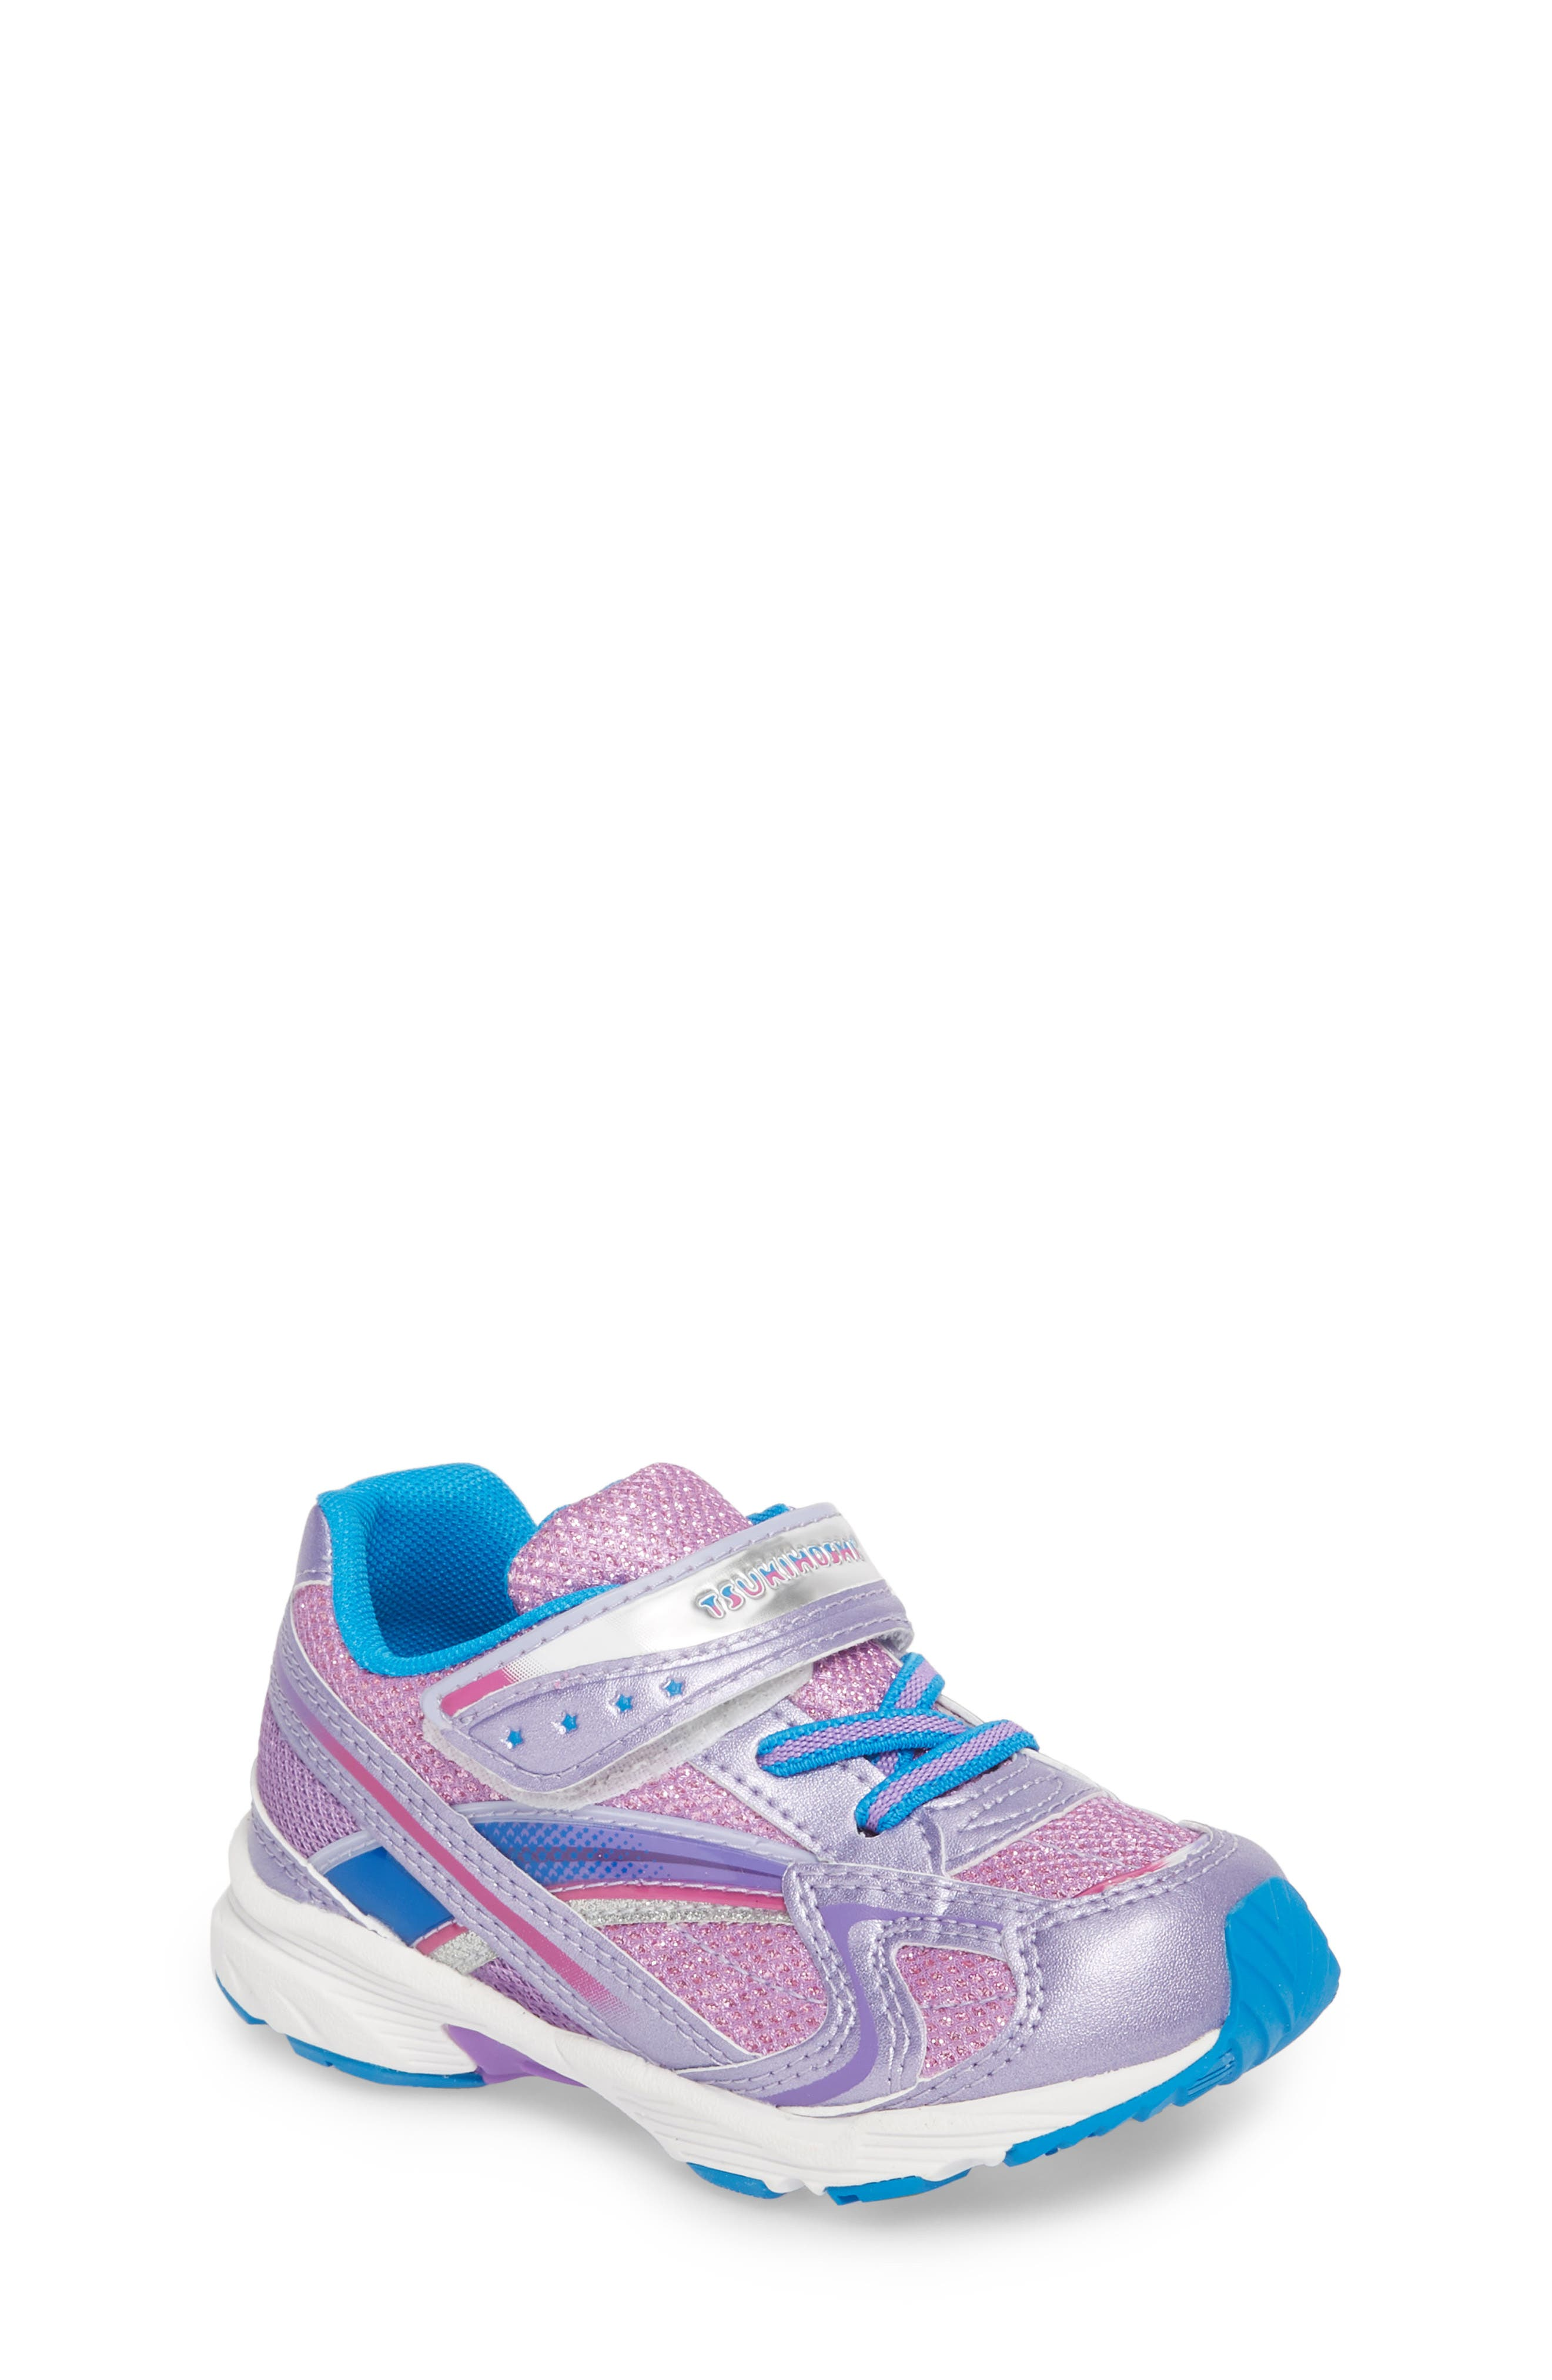 Tsukihoshi Glitz Washable Sneaker (Toddler & Little Kid)